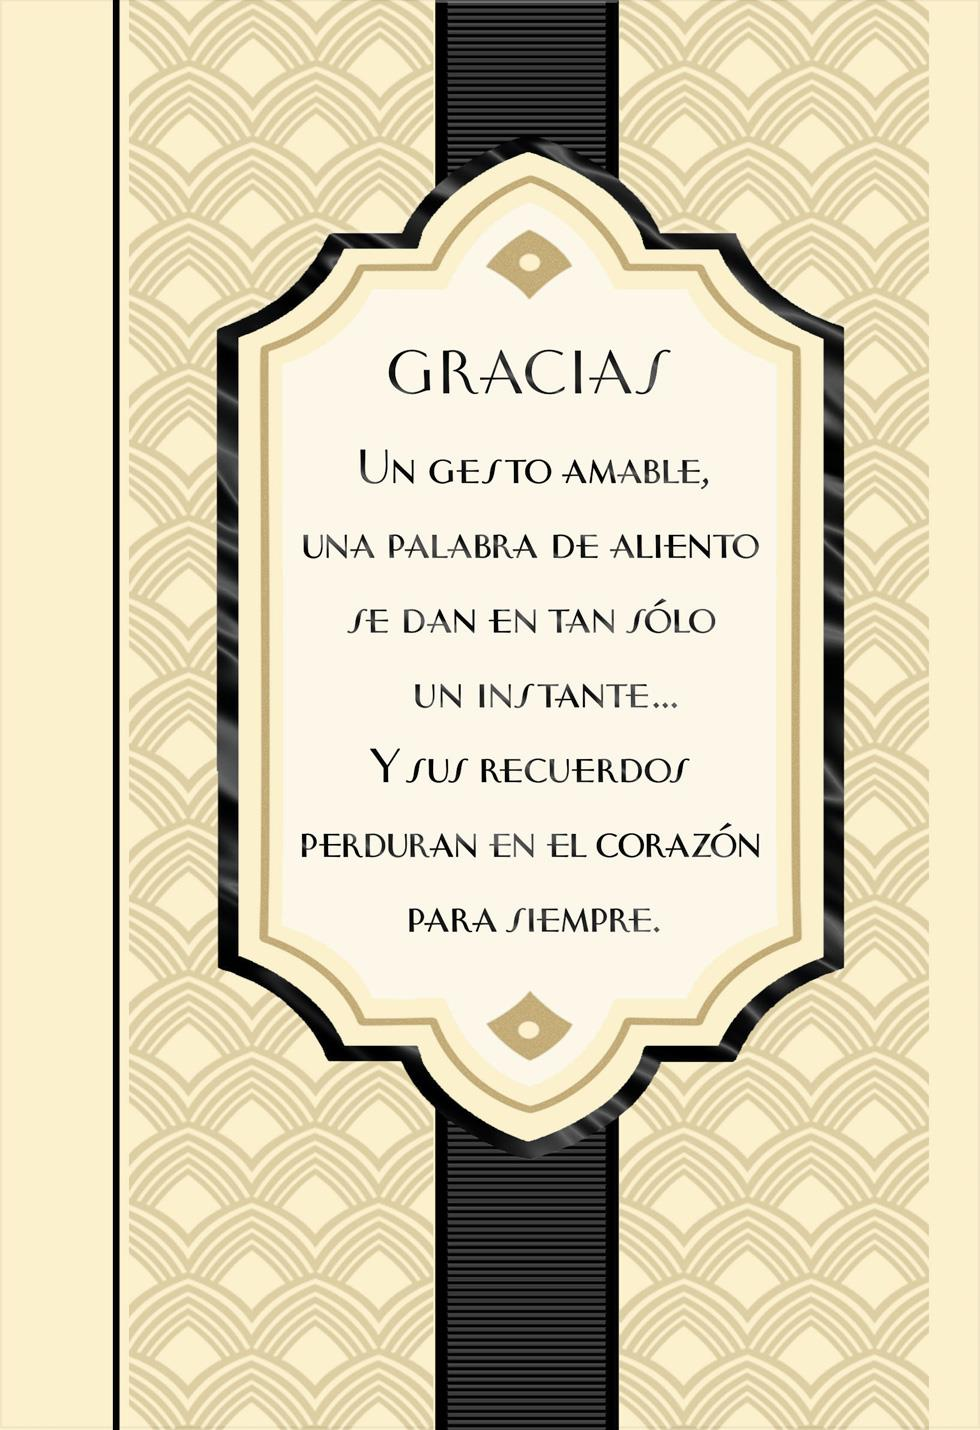 Heartfelt Kindness Spanish Language Thank You Card